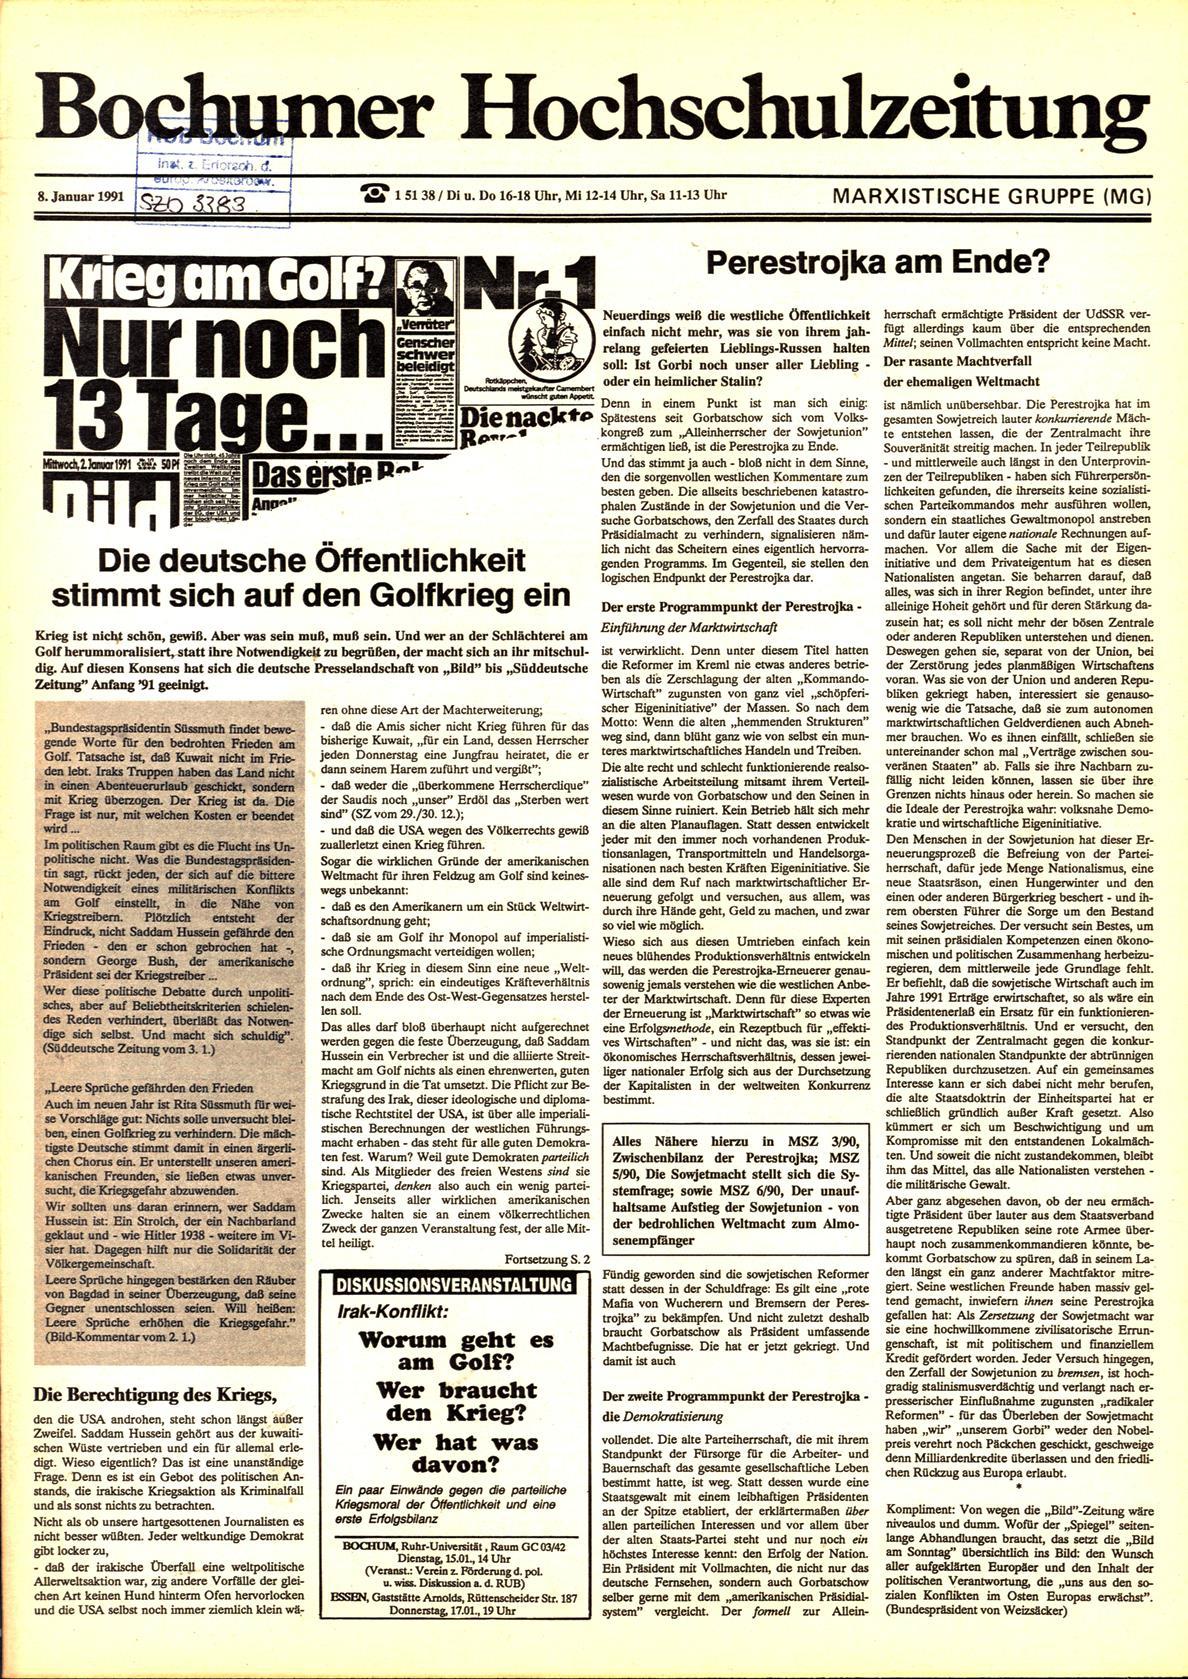 Bochum_BHZ_19910108_001